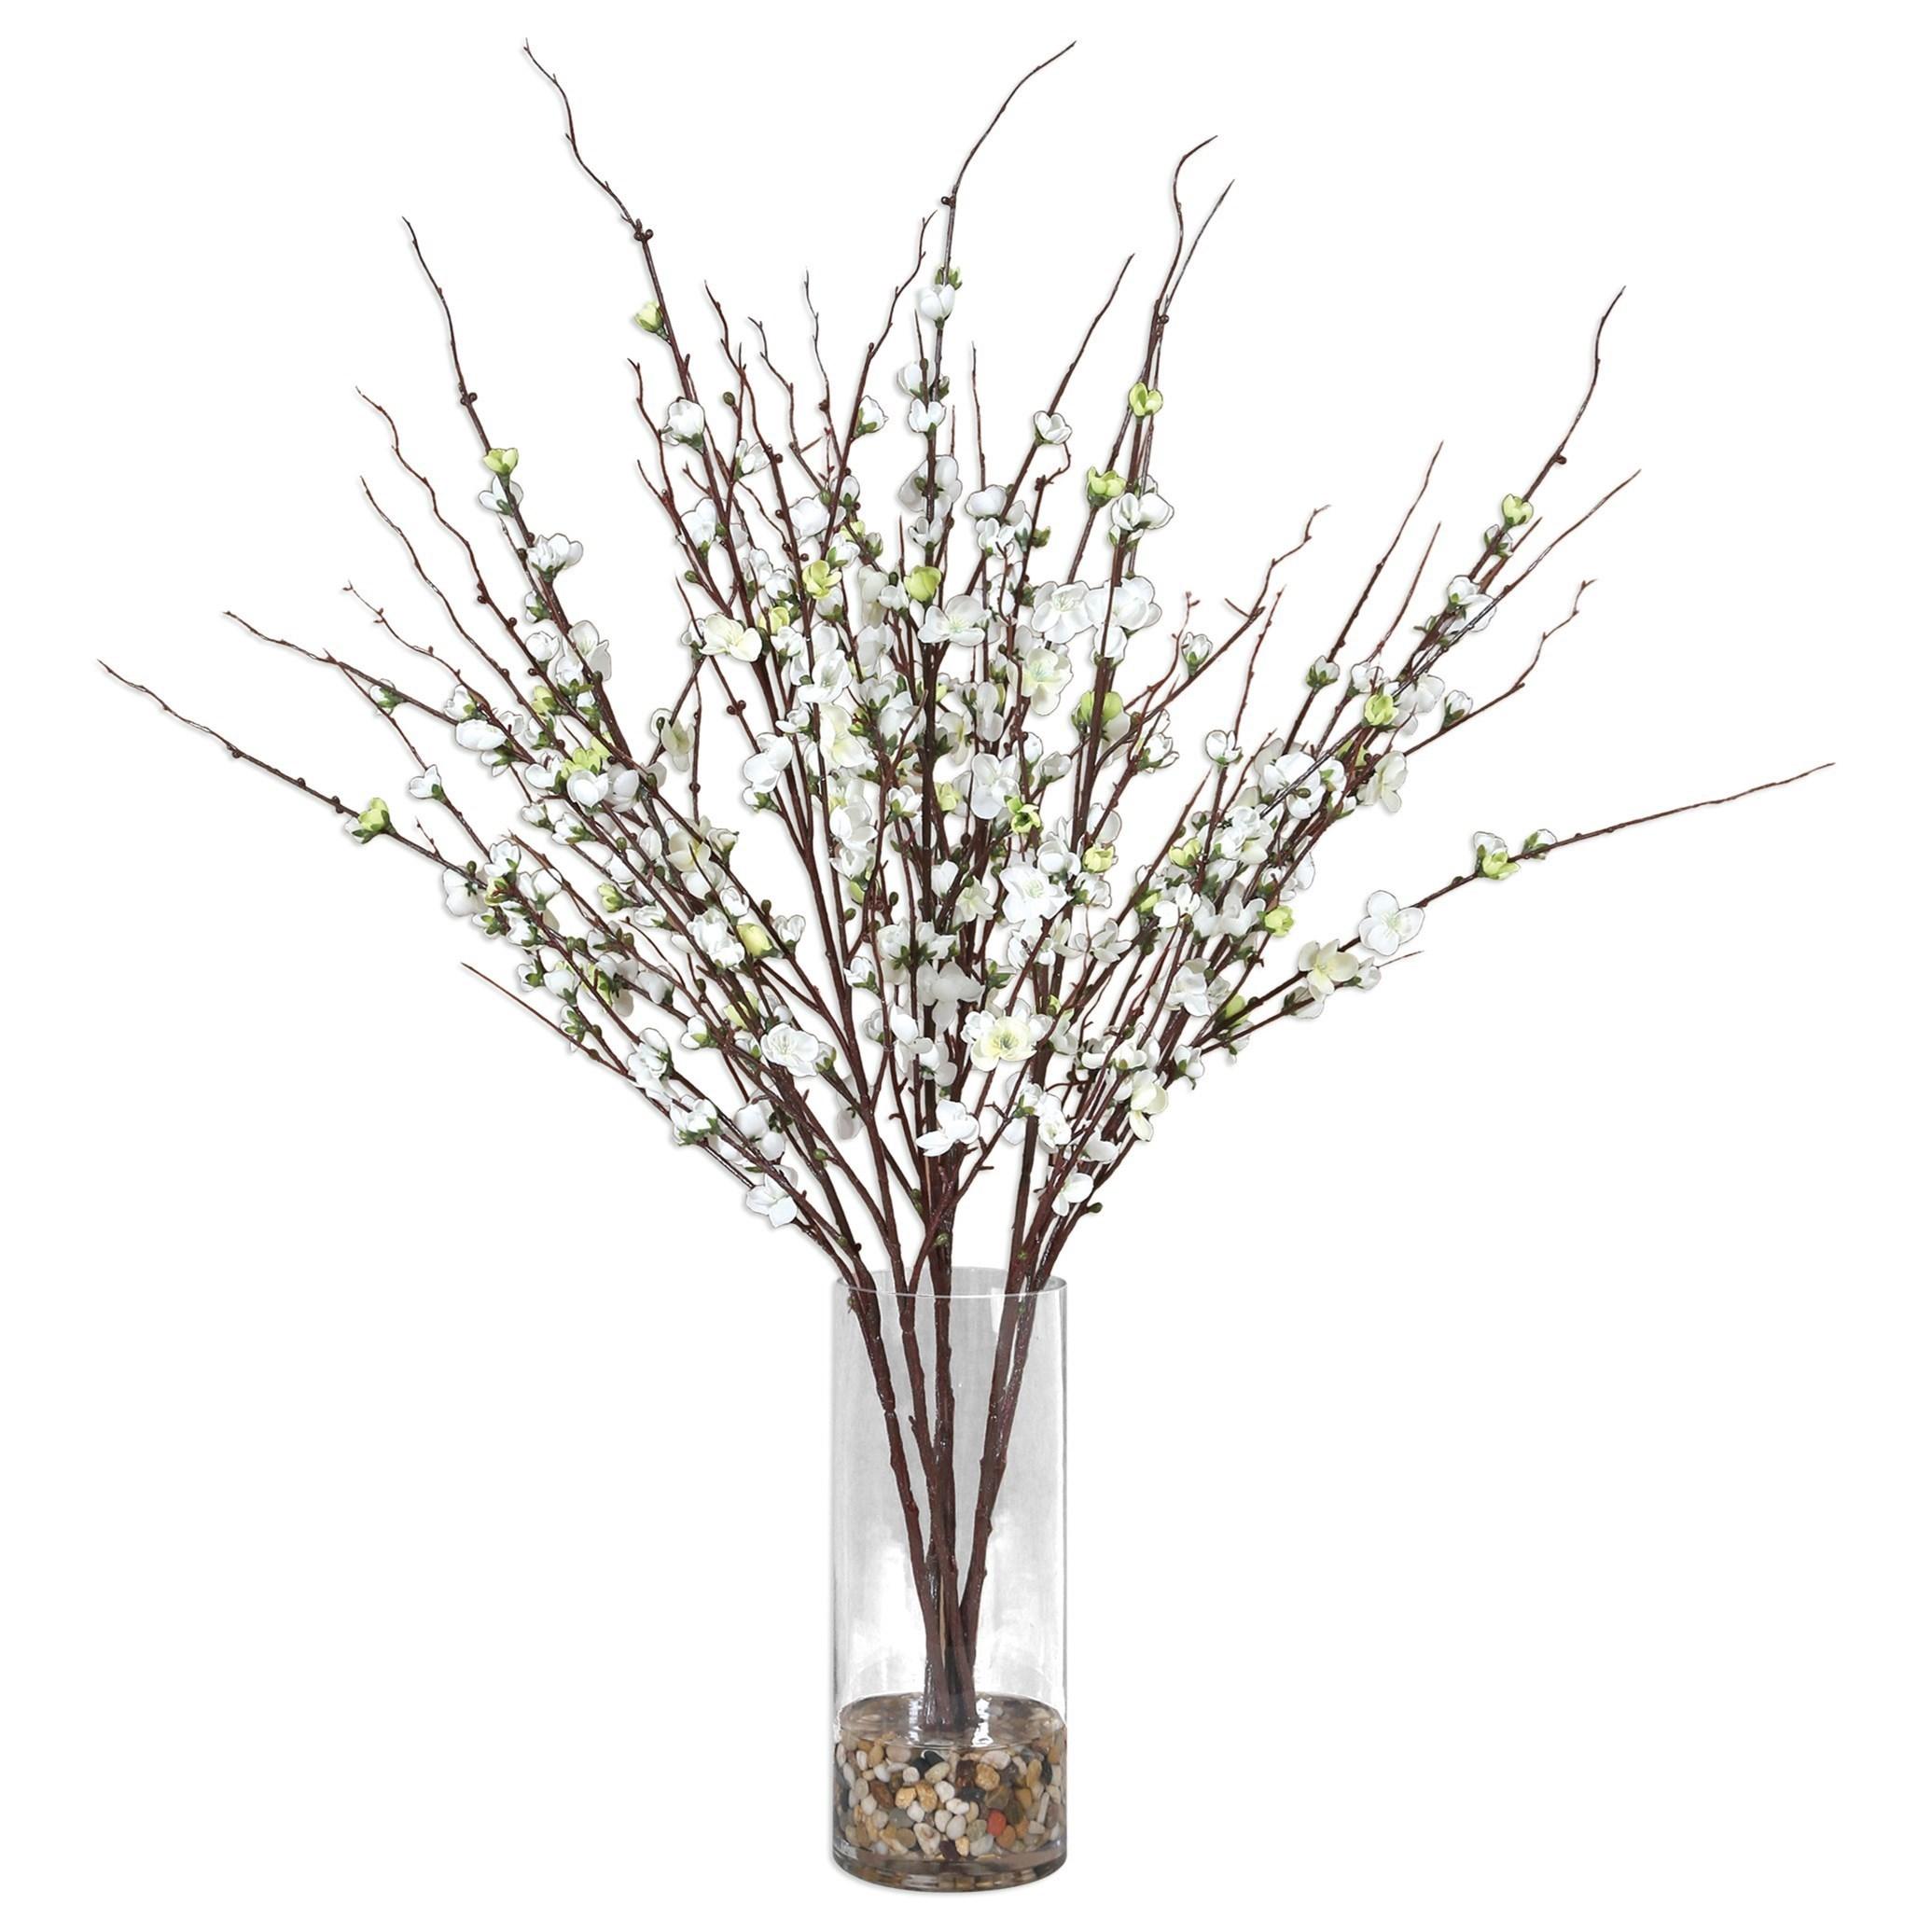 Uttermost Accessories Quince Blossoms Silk Centerpiece - Item Number: 60128